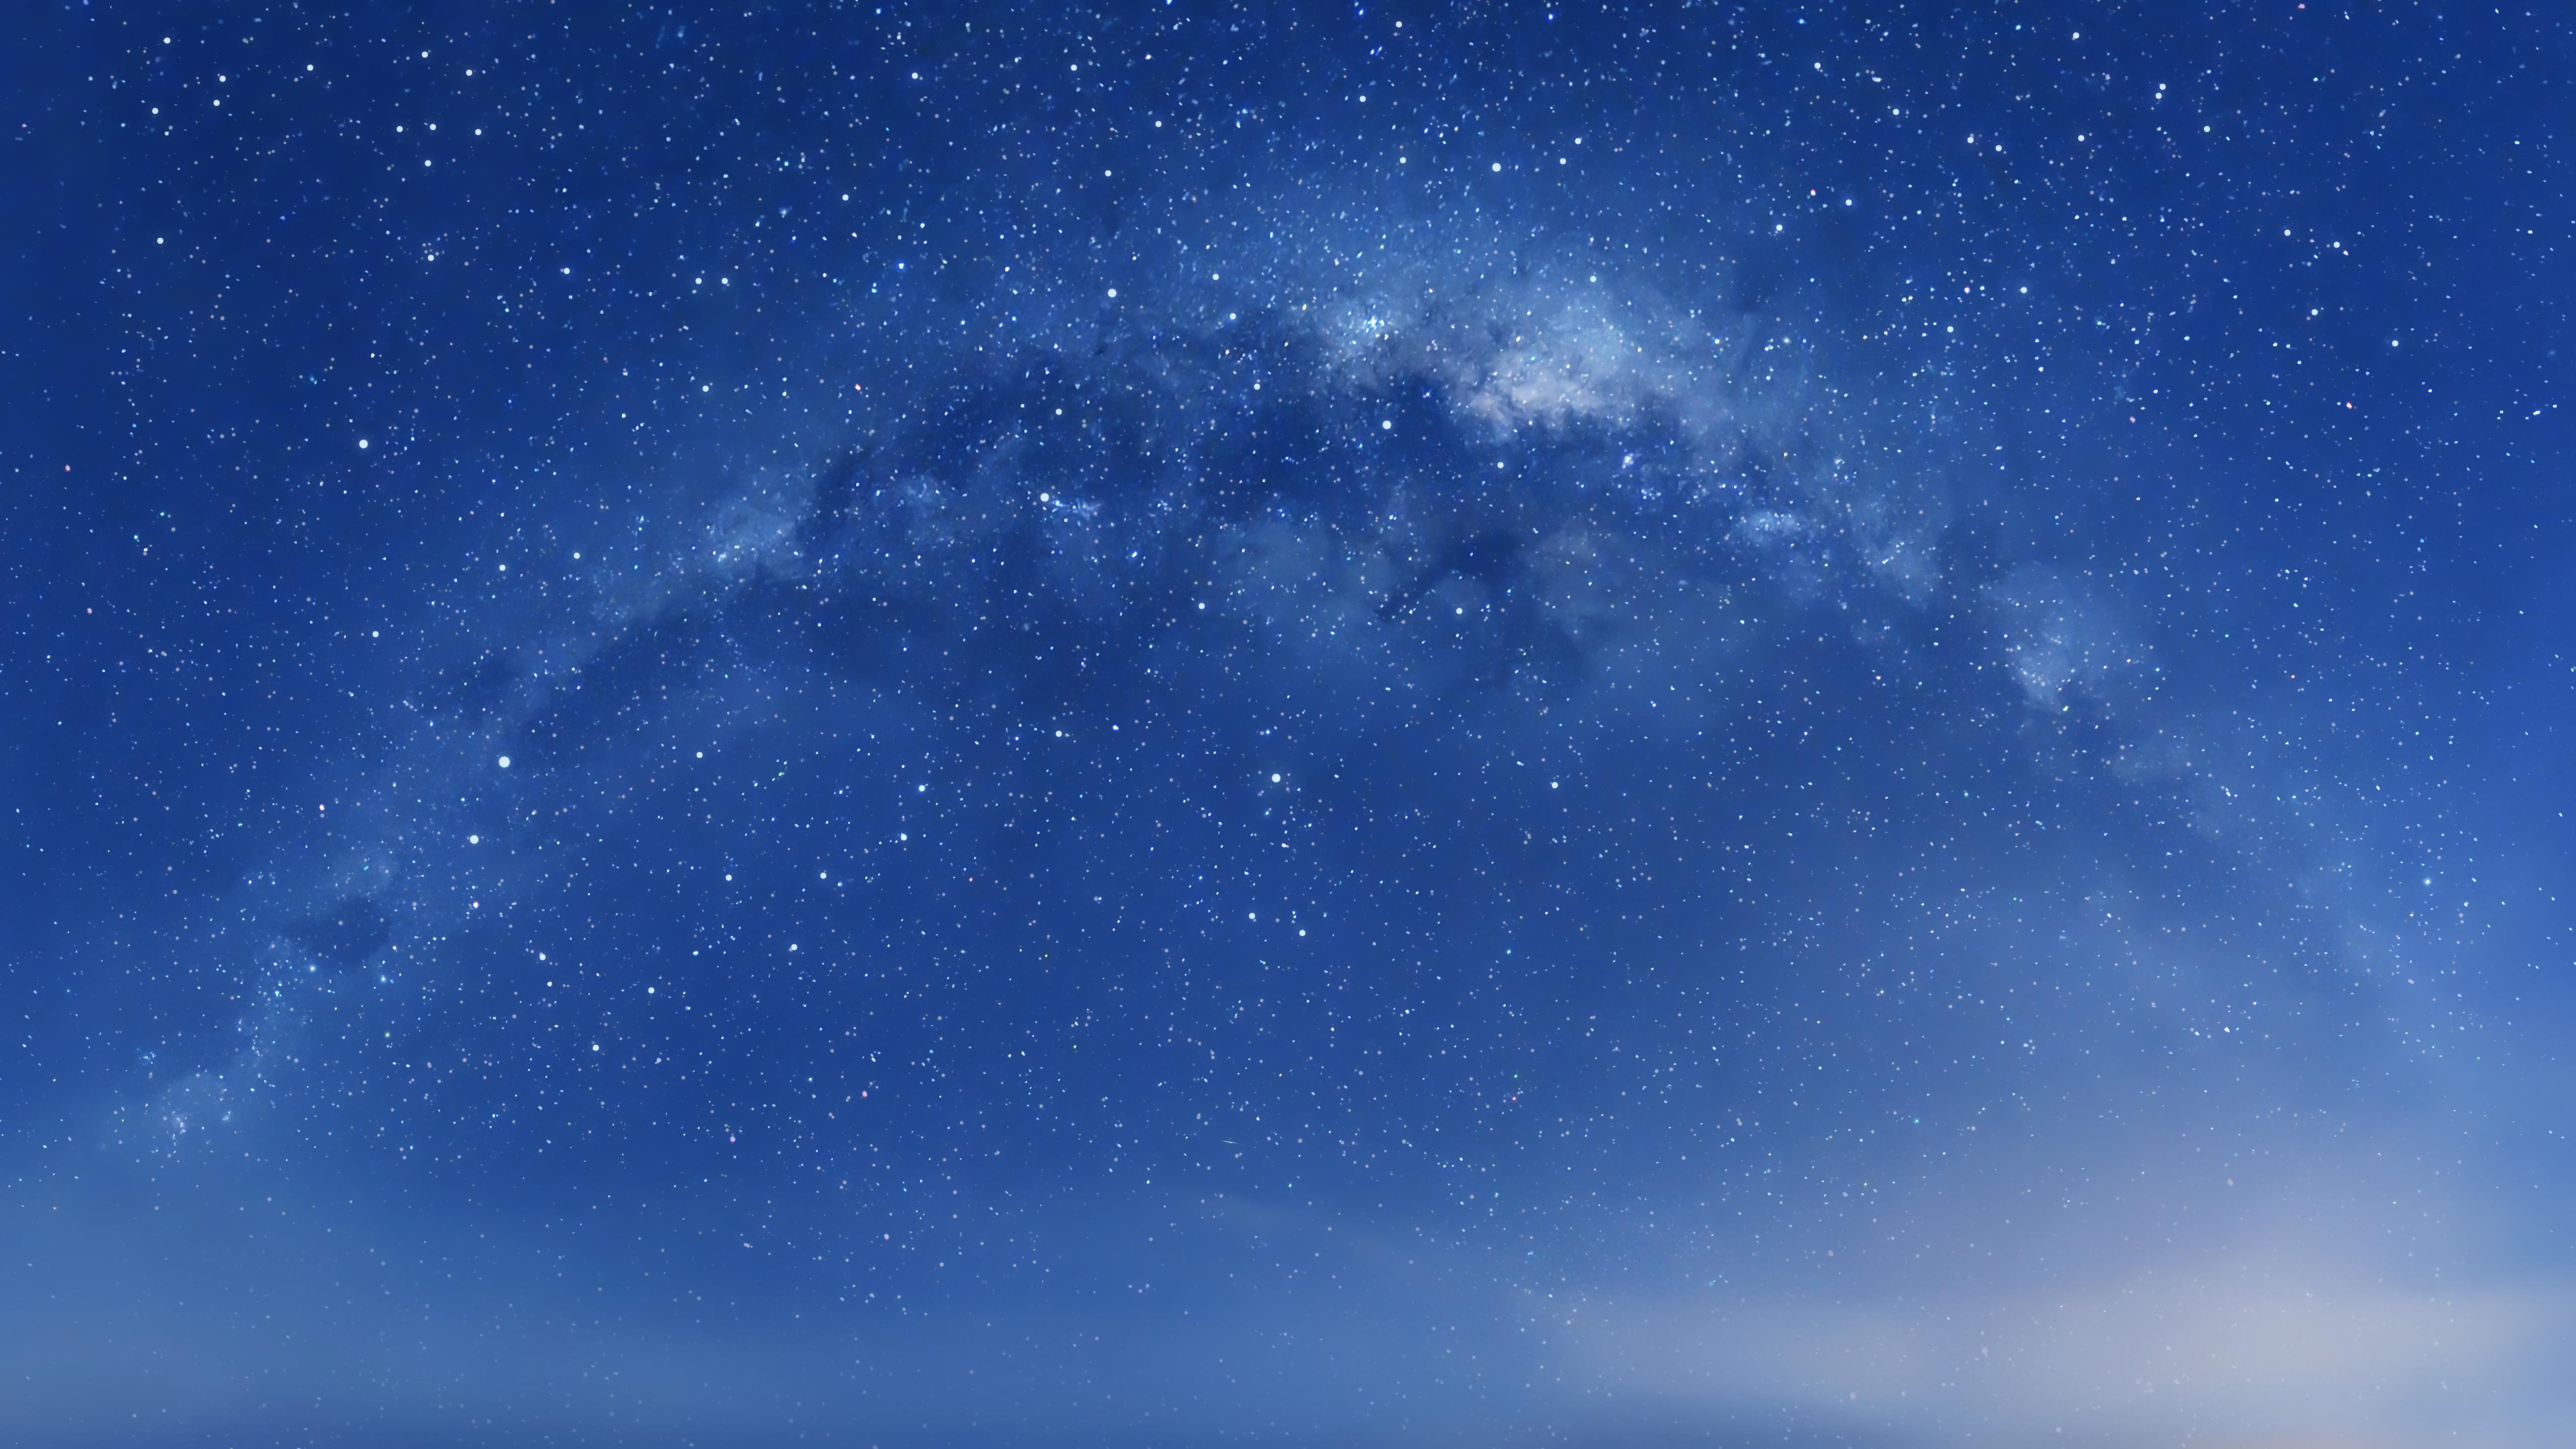 Milky way starry sky mac os x hd 4k wallpaper - Starry sky 4k ...